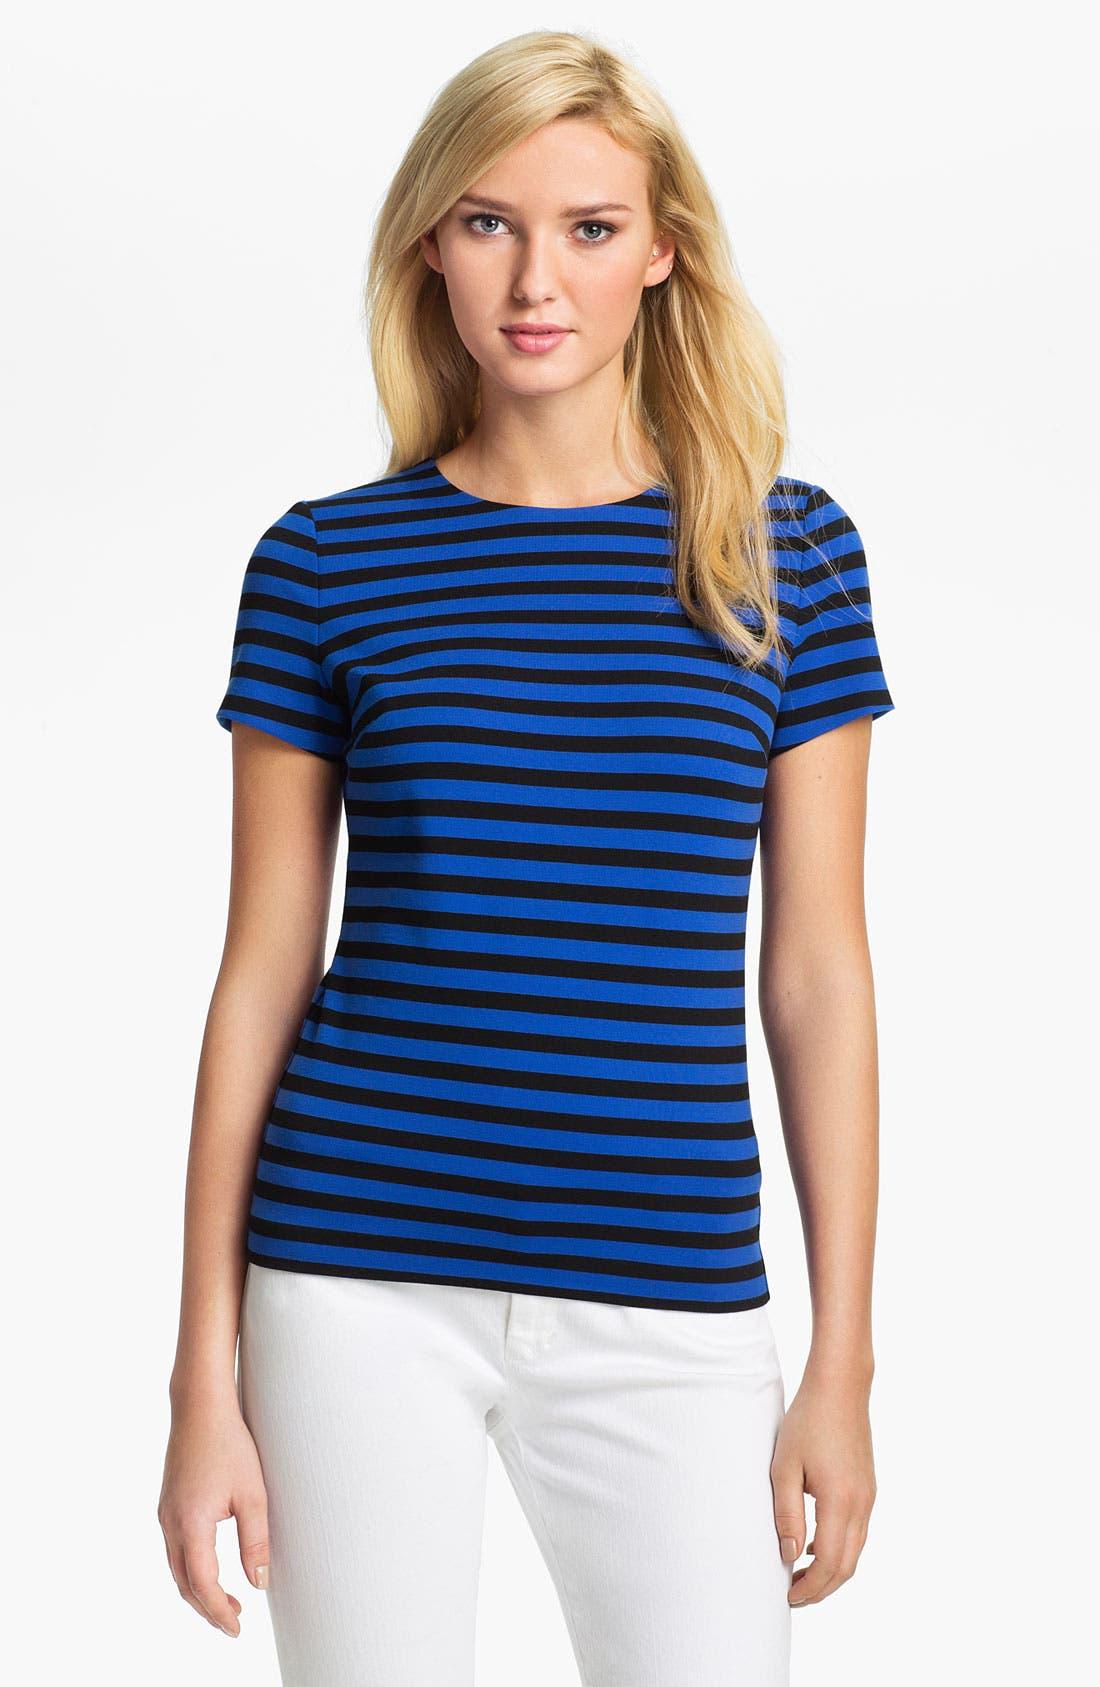 Alternate Image 1 Selected - MICHAEL Michael Kors Short Sleeve Stripe Top